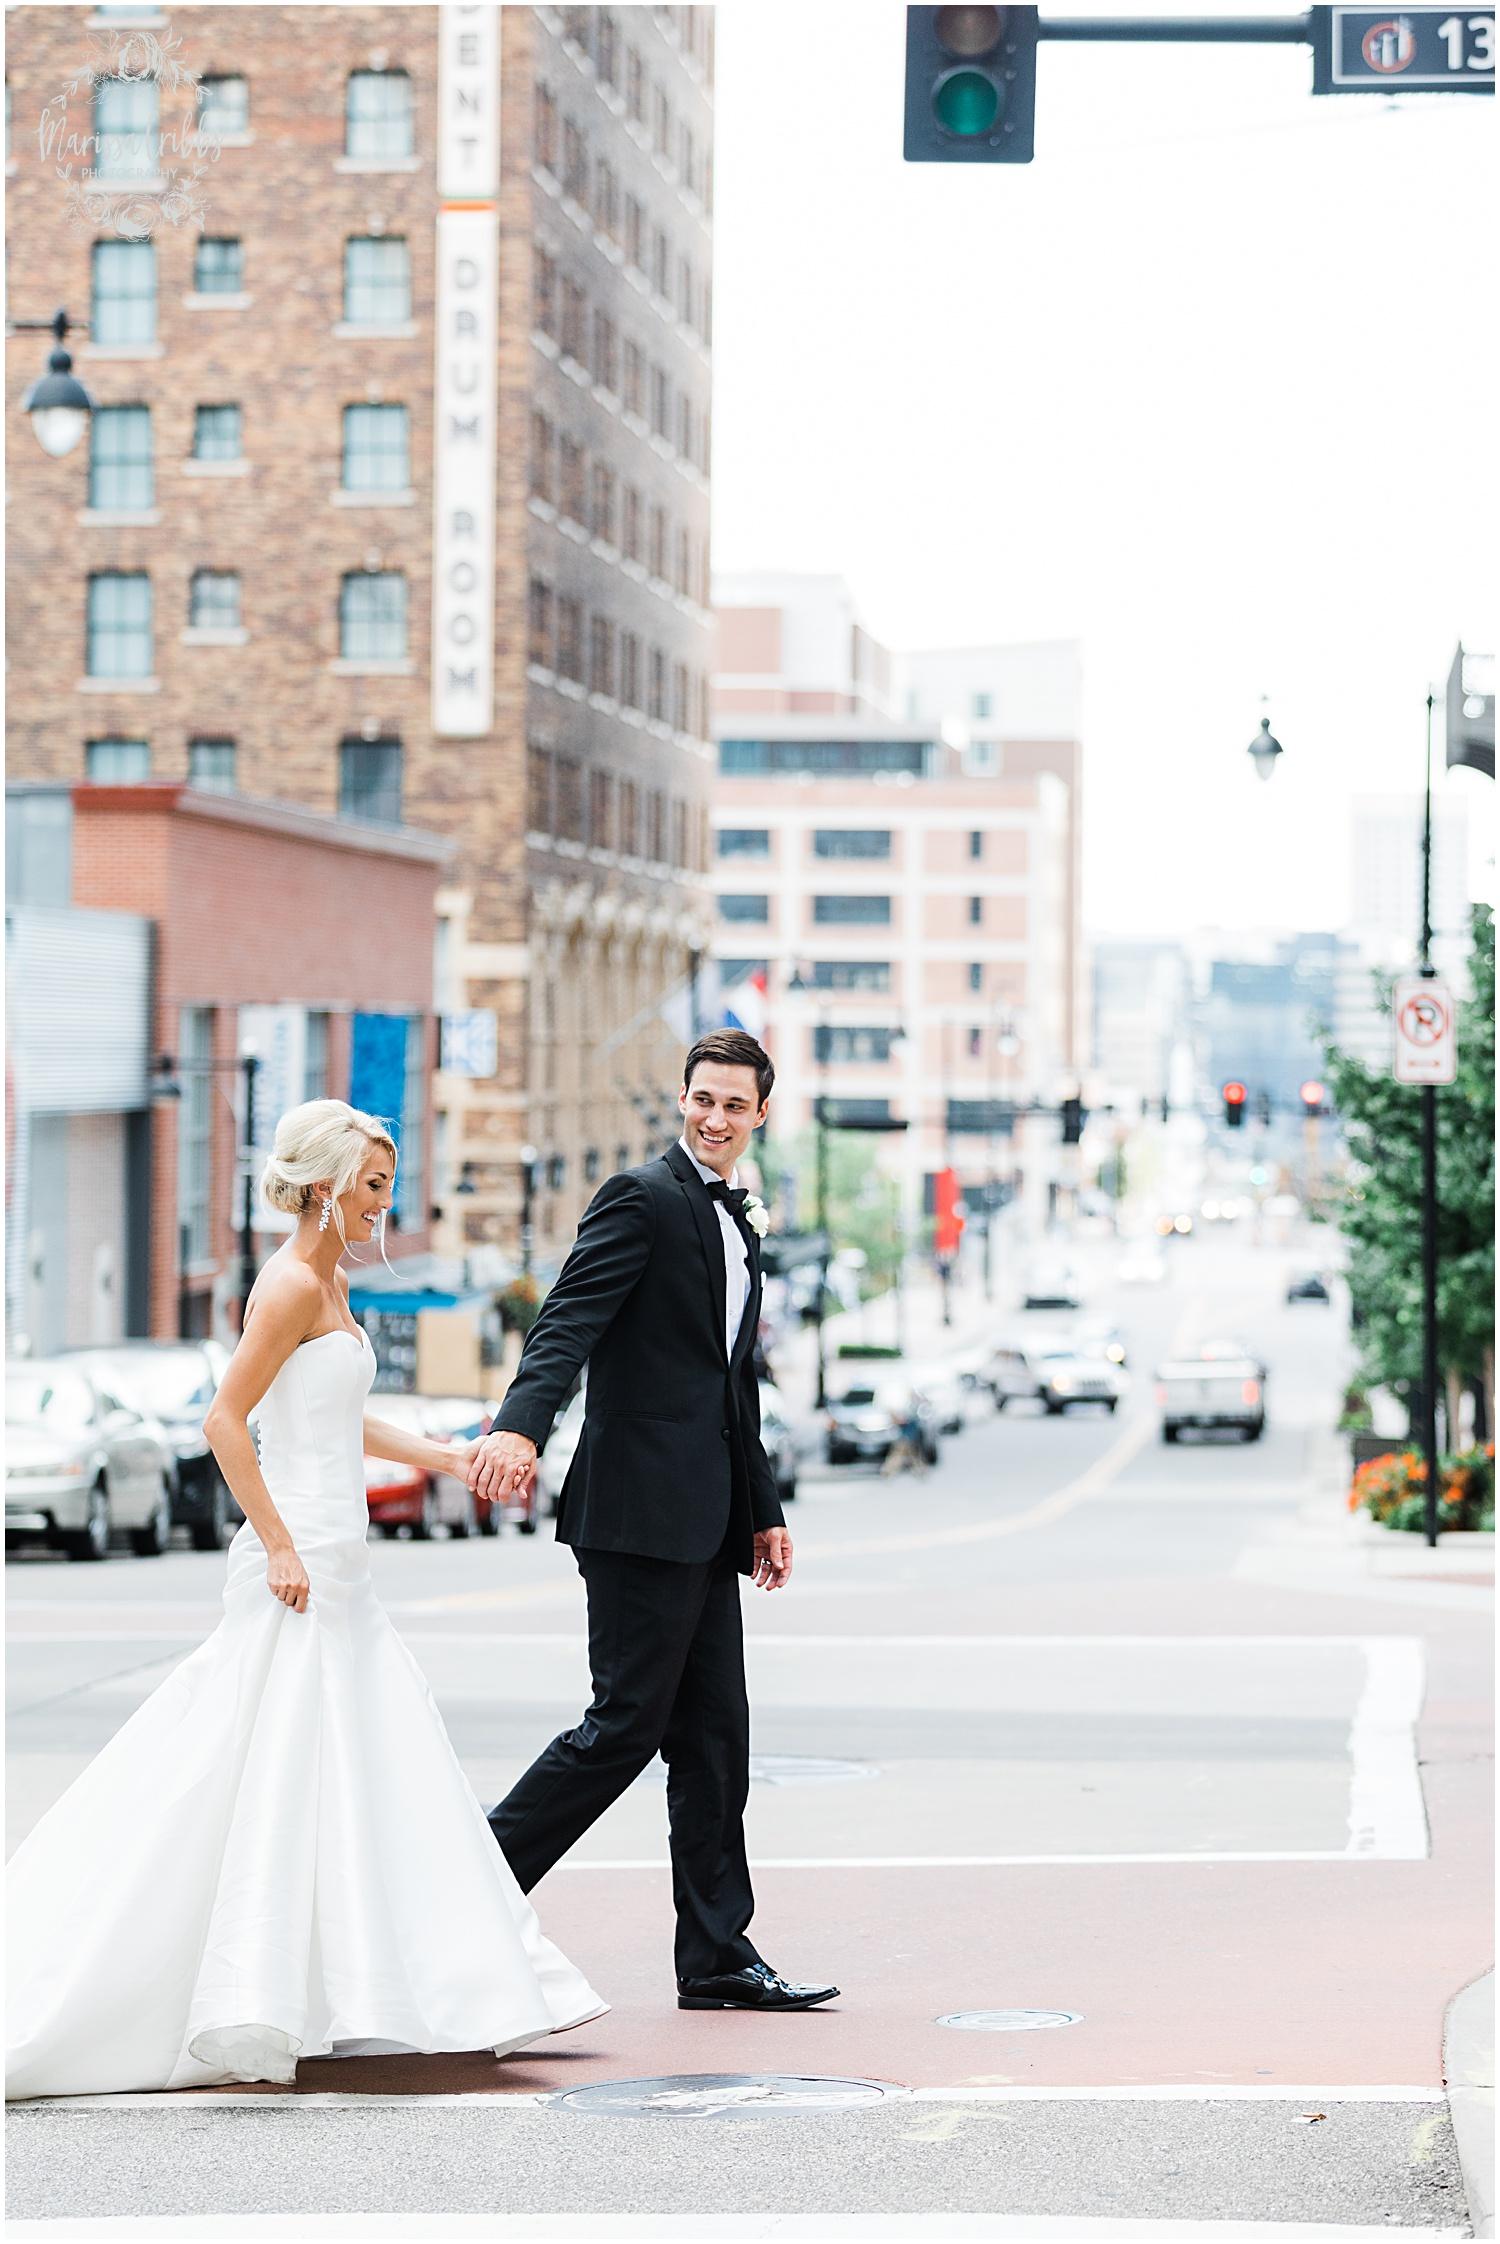 NOLL WEDDING | THE BRASS ON BALTIMORE | MARISSA CRIBBS PHOTOGRAPHY_6341.jpg